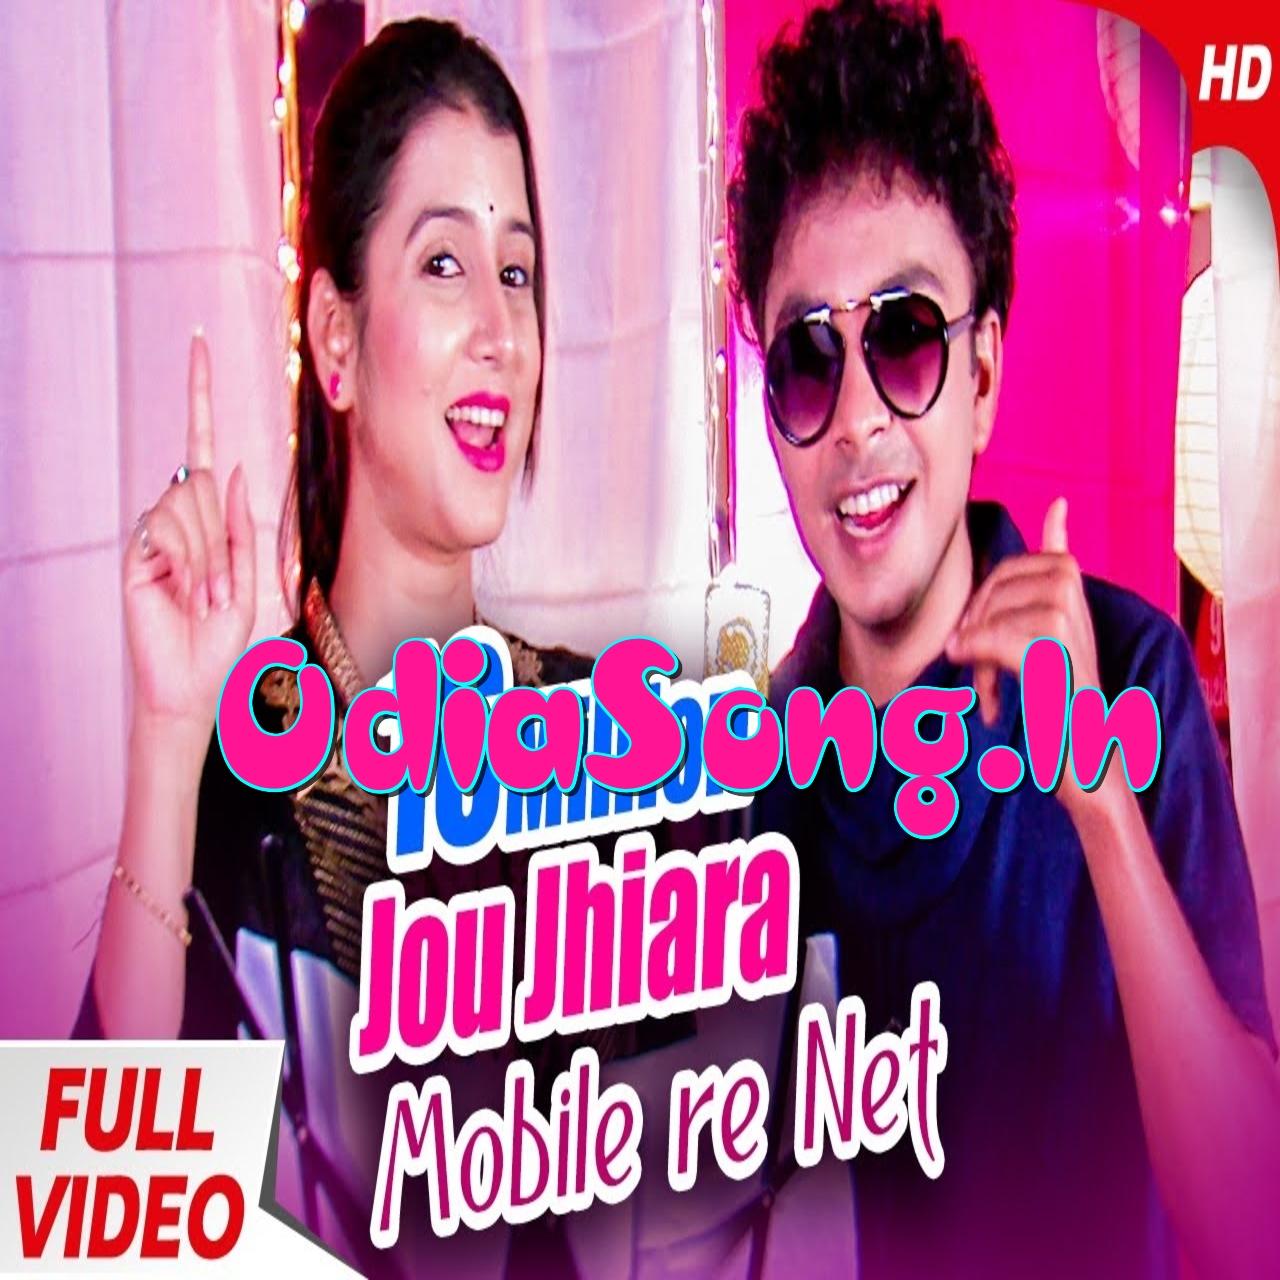 Jou Jhiara Mobile Re Net (Dipti Rekha, Mantu Chhuria)